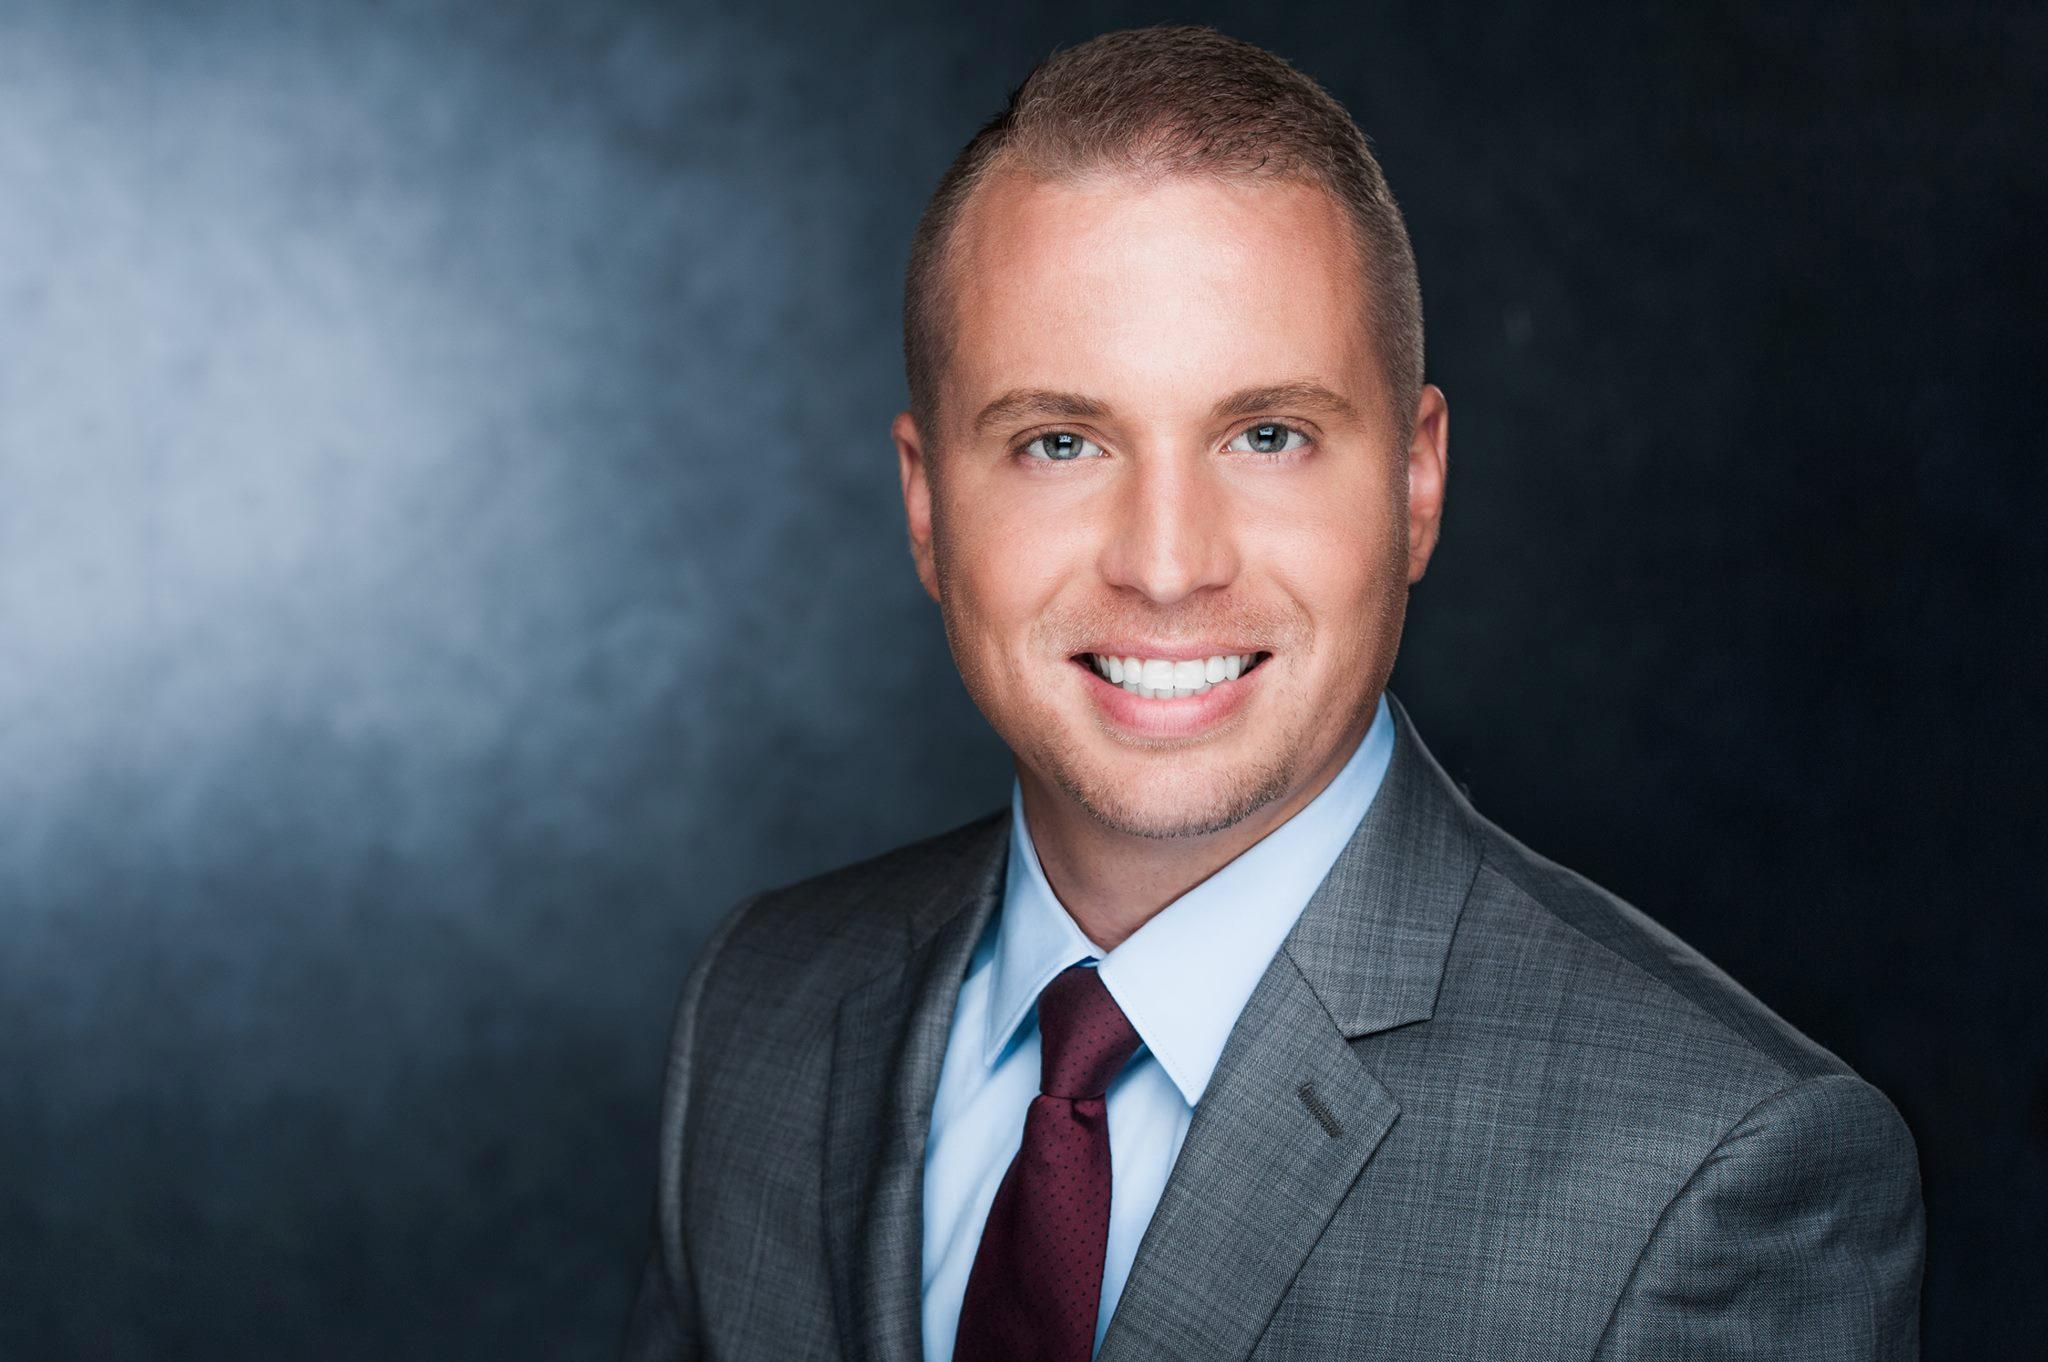 HENRY RYAN DENNEY Financial Professional & Insurance Agent